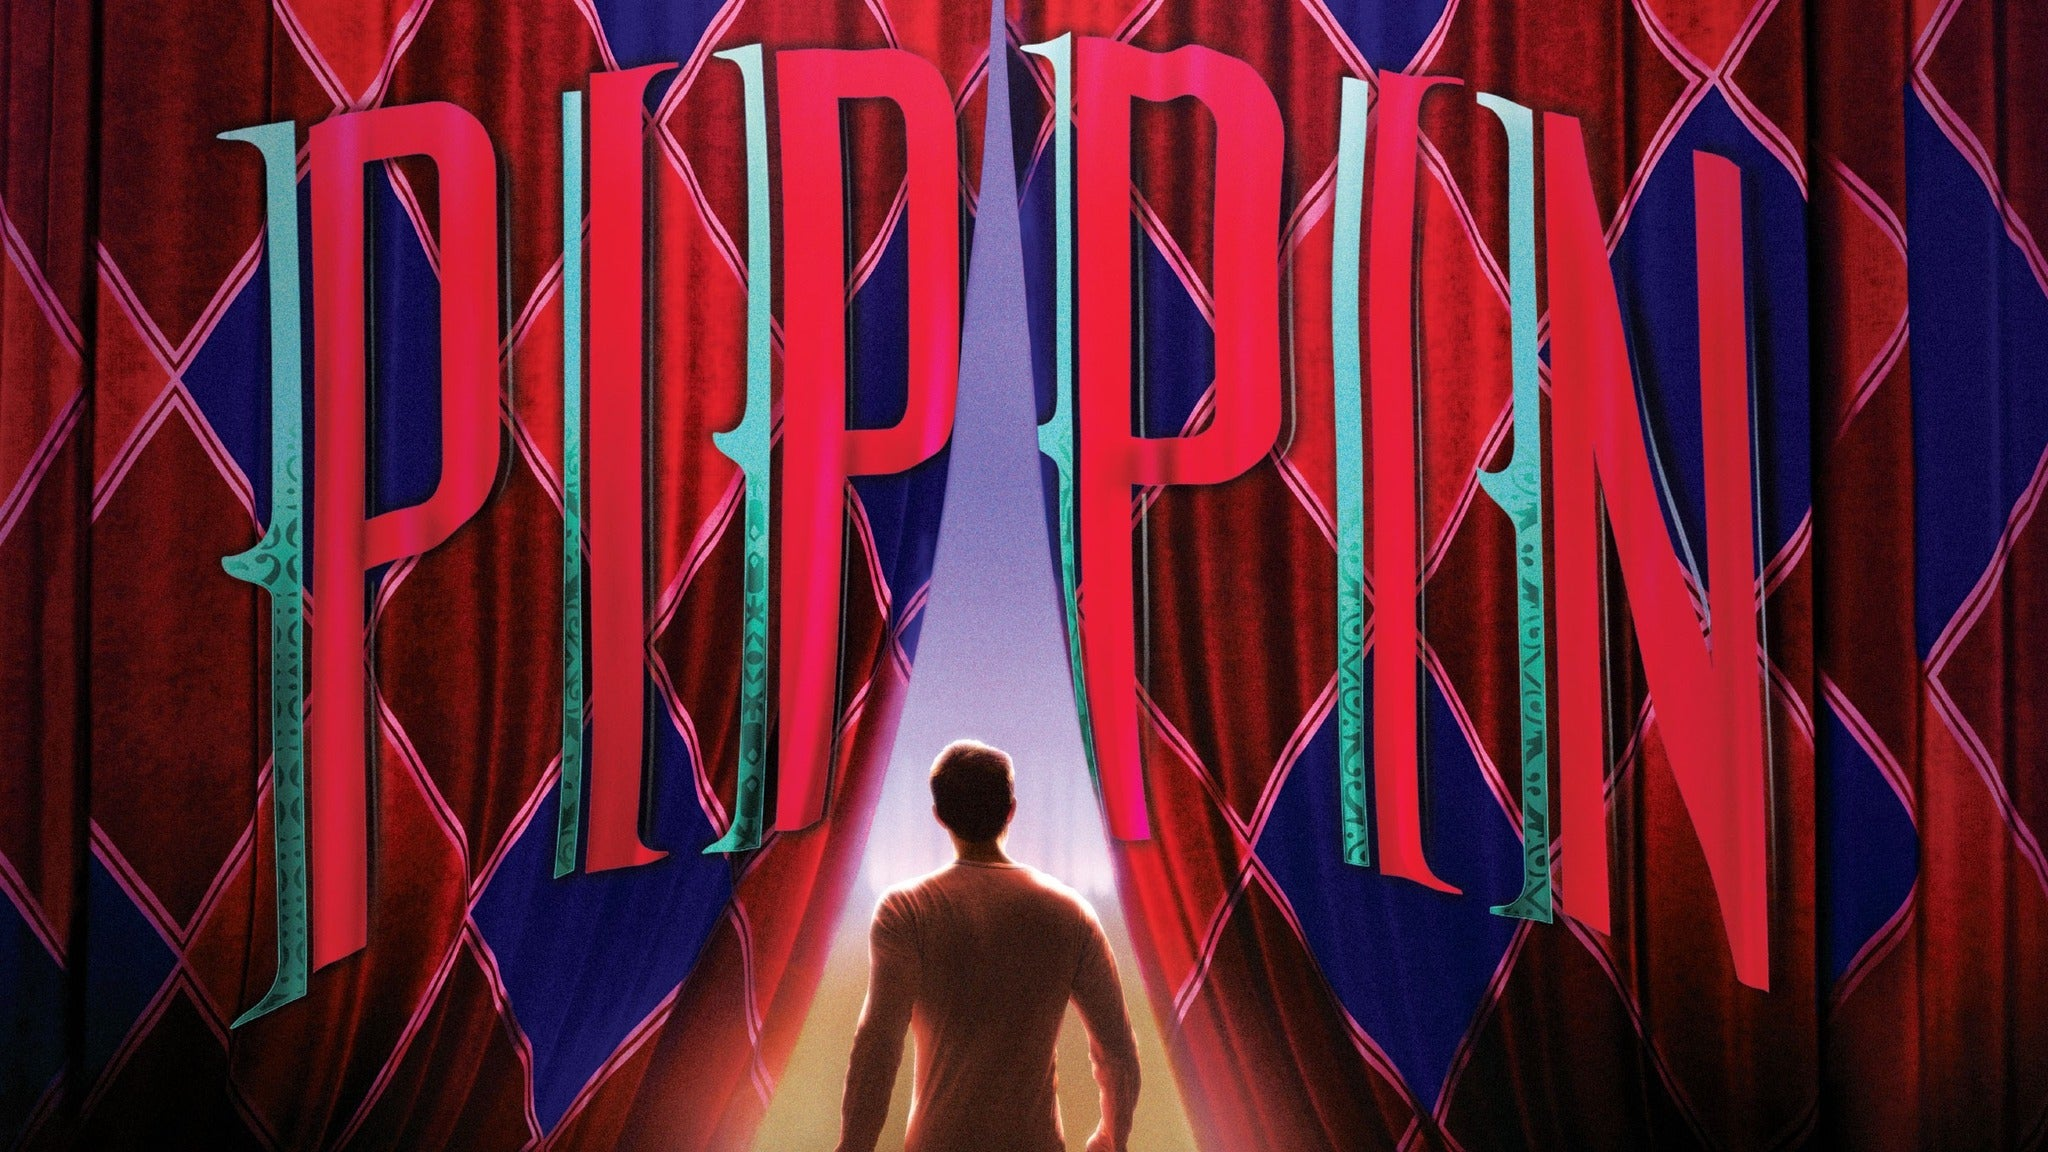 Pippin (Touring) at Lexington Opera House - Lexington, KY 40507